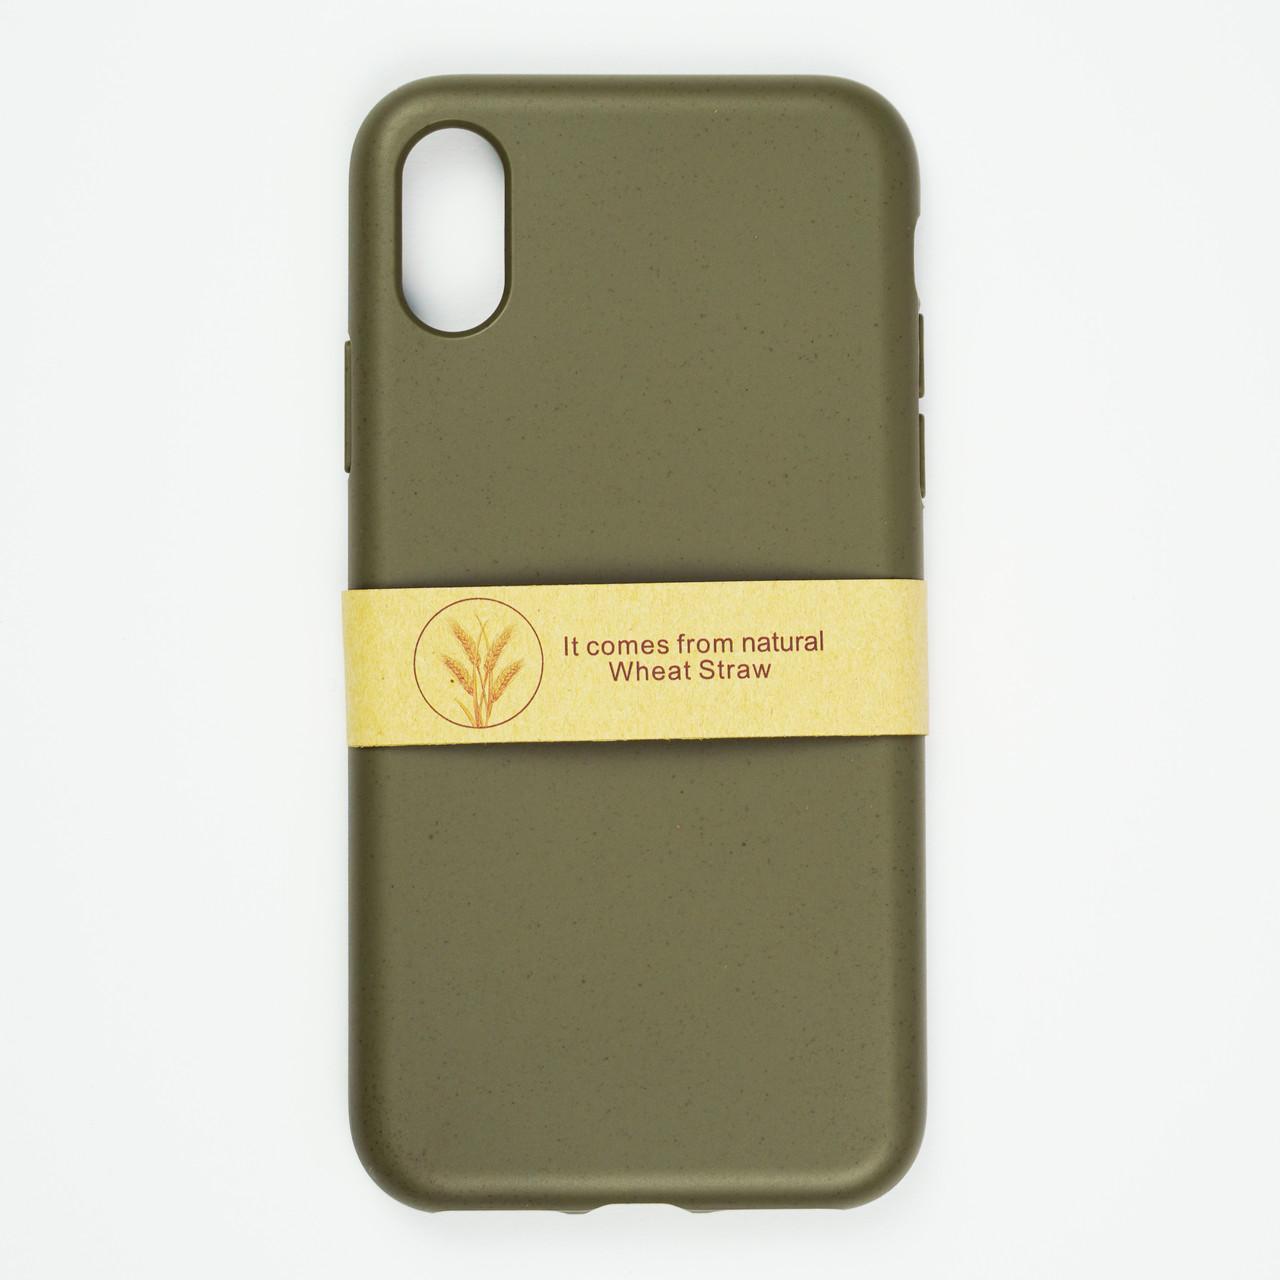 Биоразлагаемый чехол ECO Wheat Straw для iPhone Xs Max Green